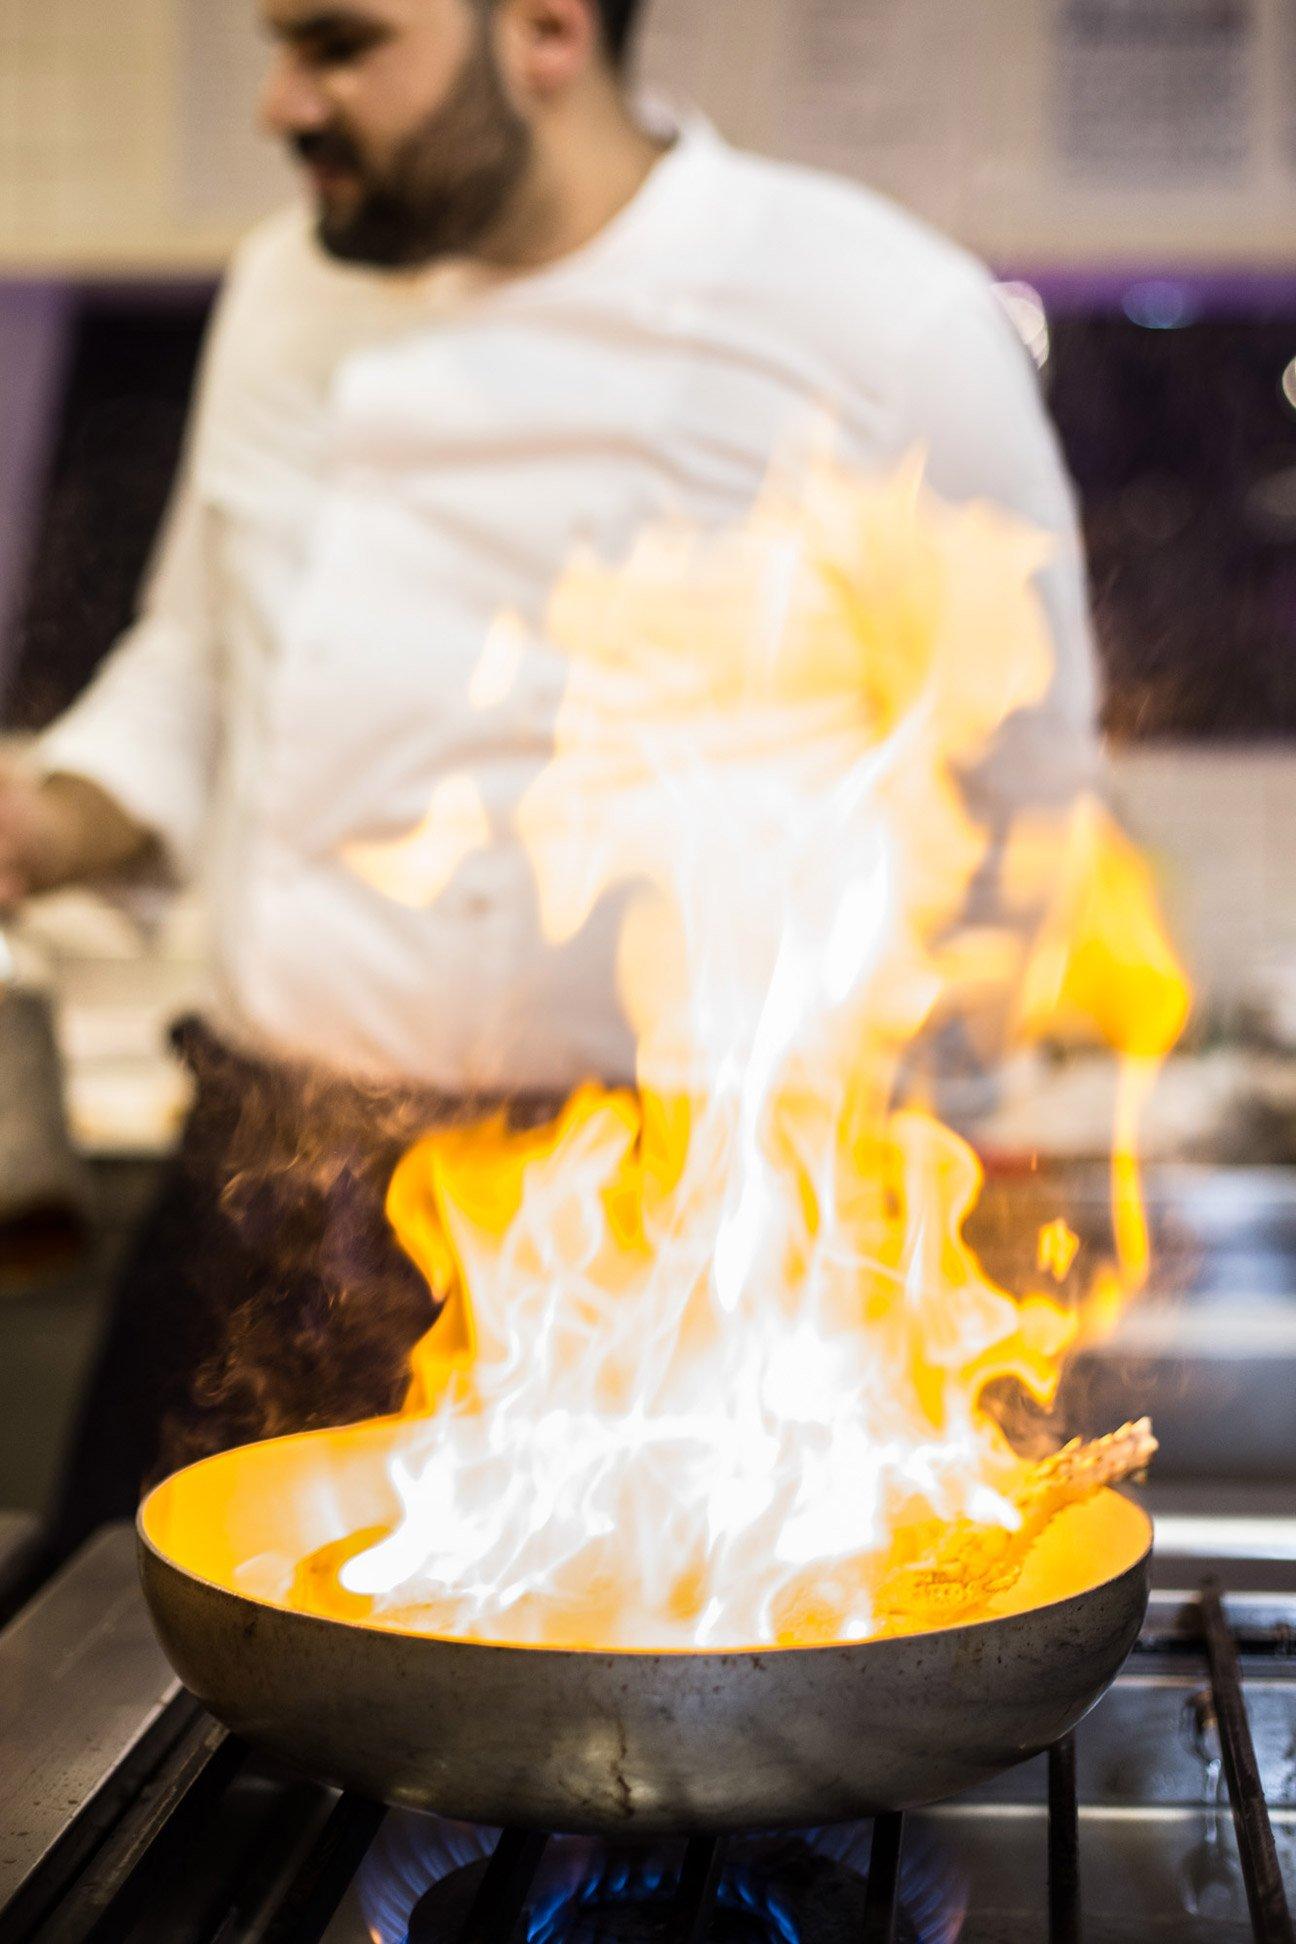 fabiencuffel_agence_communication_photographie_edition_graphisme_geneve_paris_restaurant_Damatteo_6